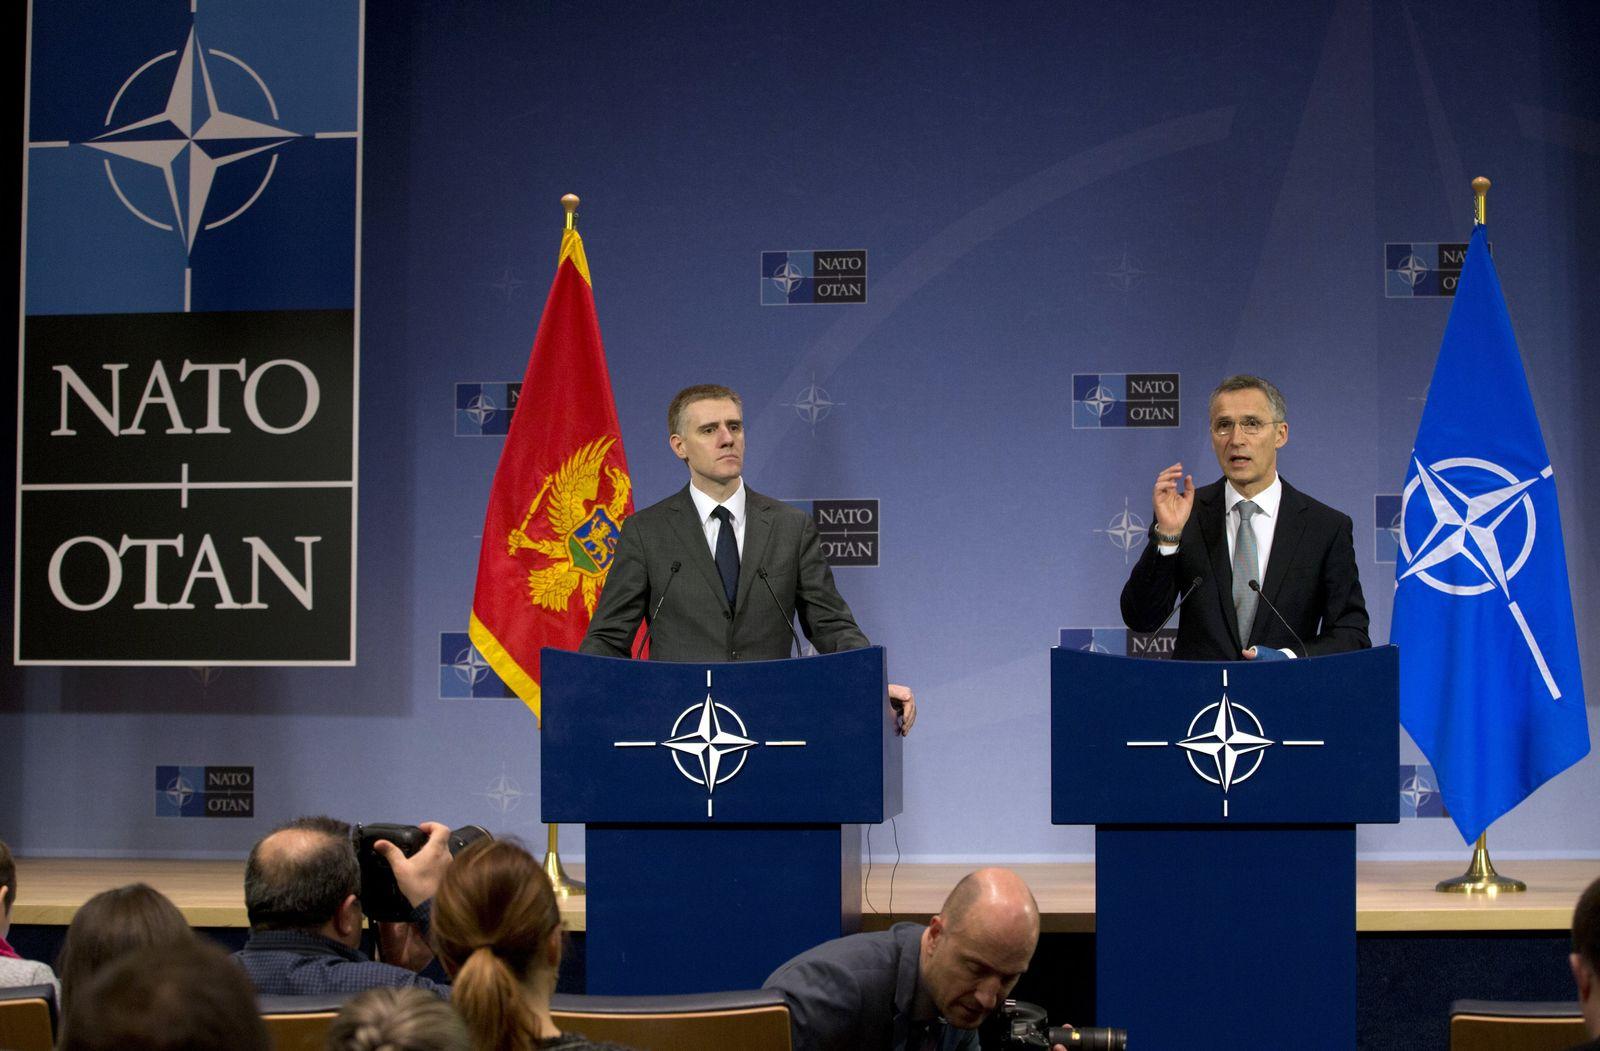 Nato / Stoltenberg / Luksic